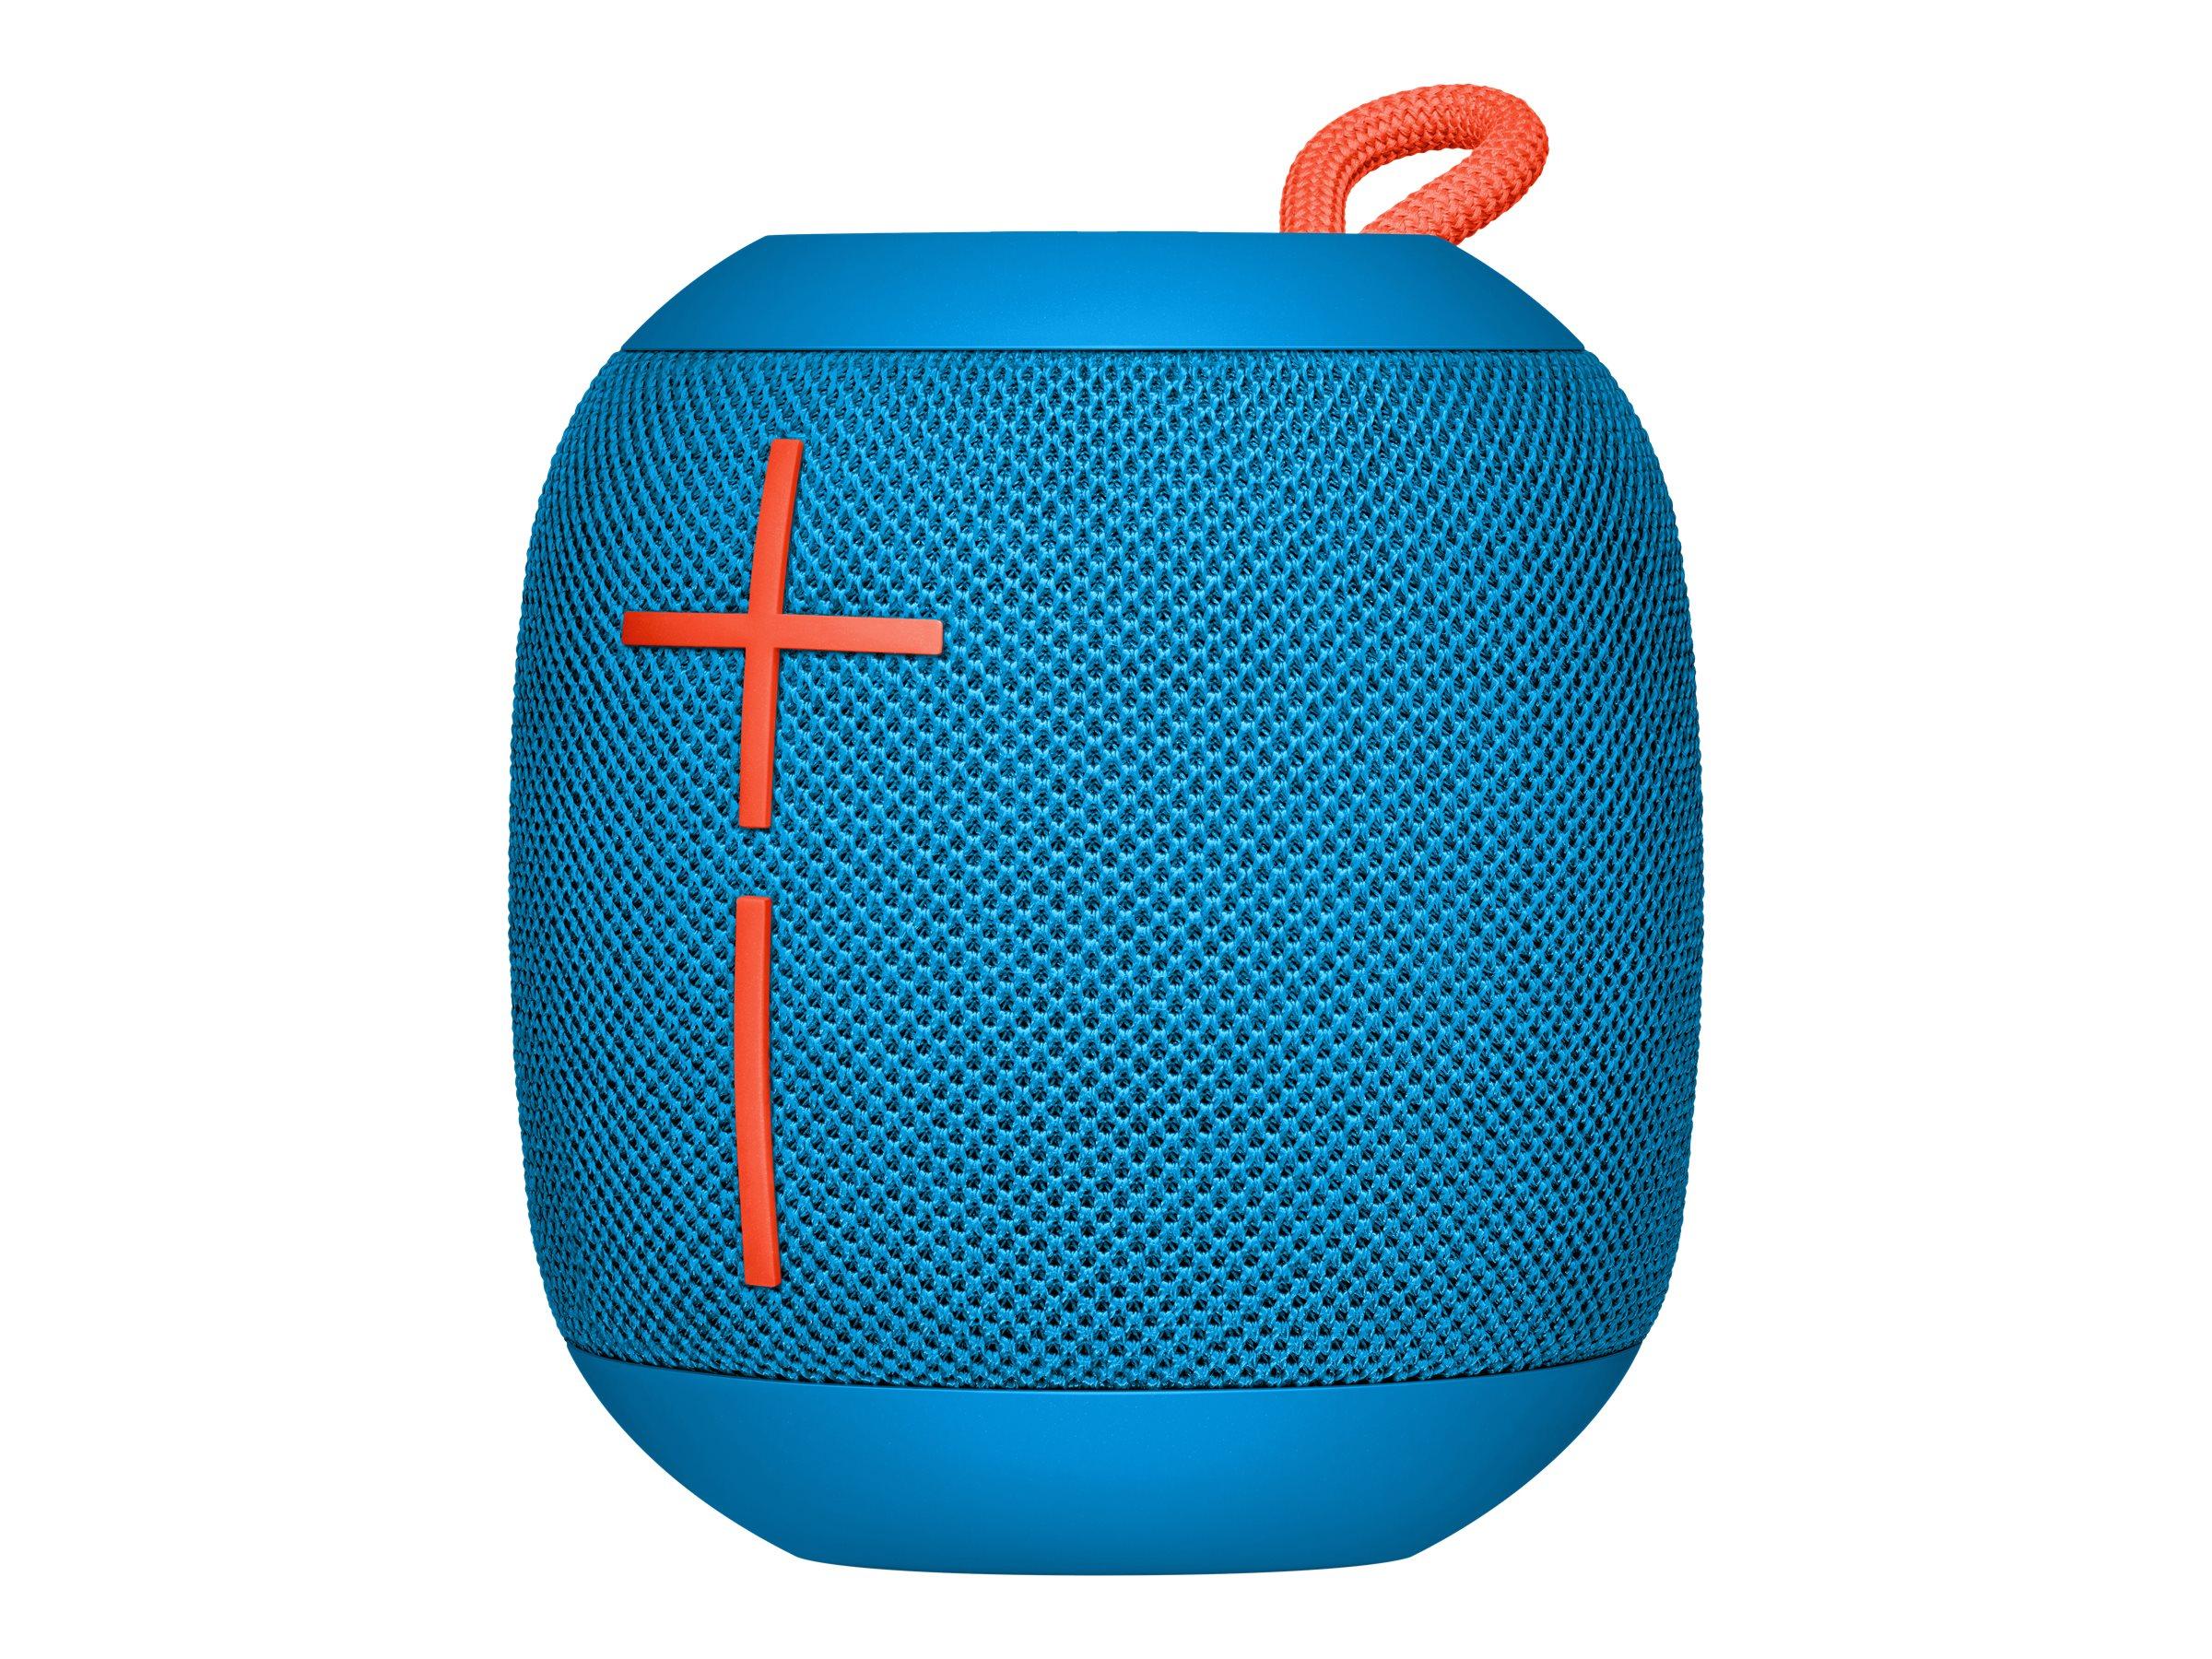 Ultimate Ears WONDERBOOM - Lautsprecher - tragbar - kabellos - Bluetooth - Minustemperatur